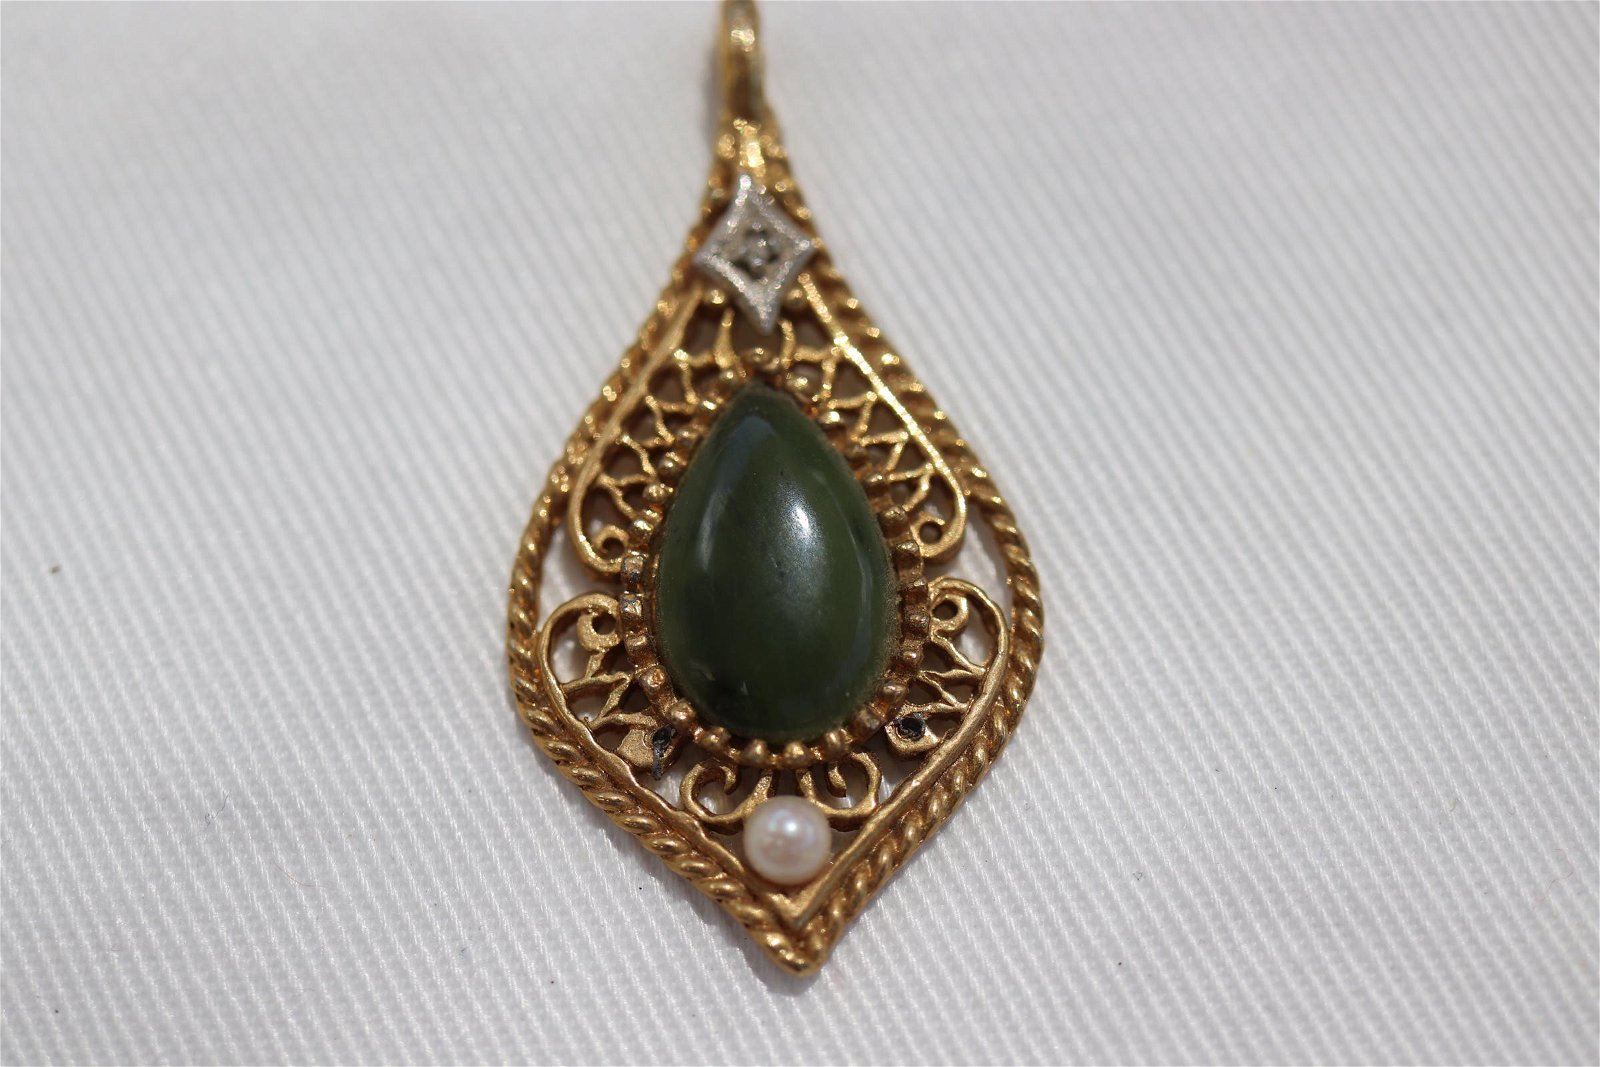 Vintage Gold tone Teardrop Necklace Pendant